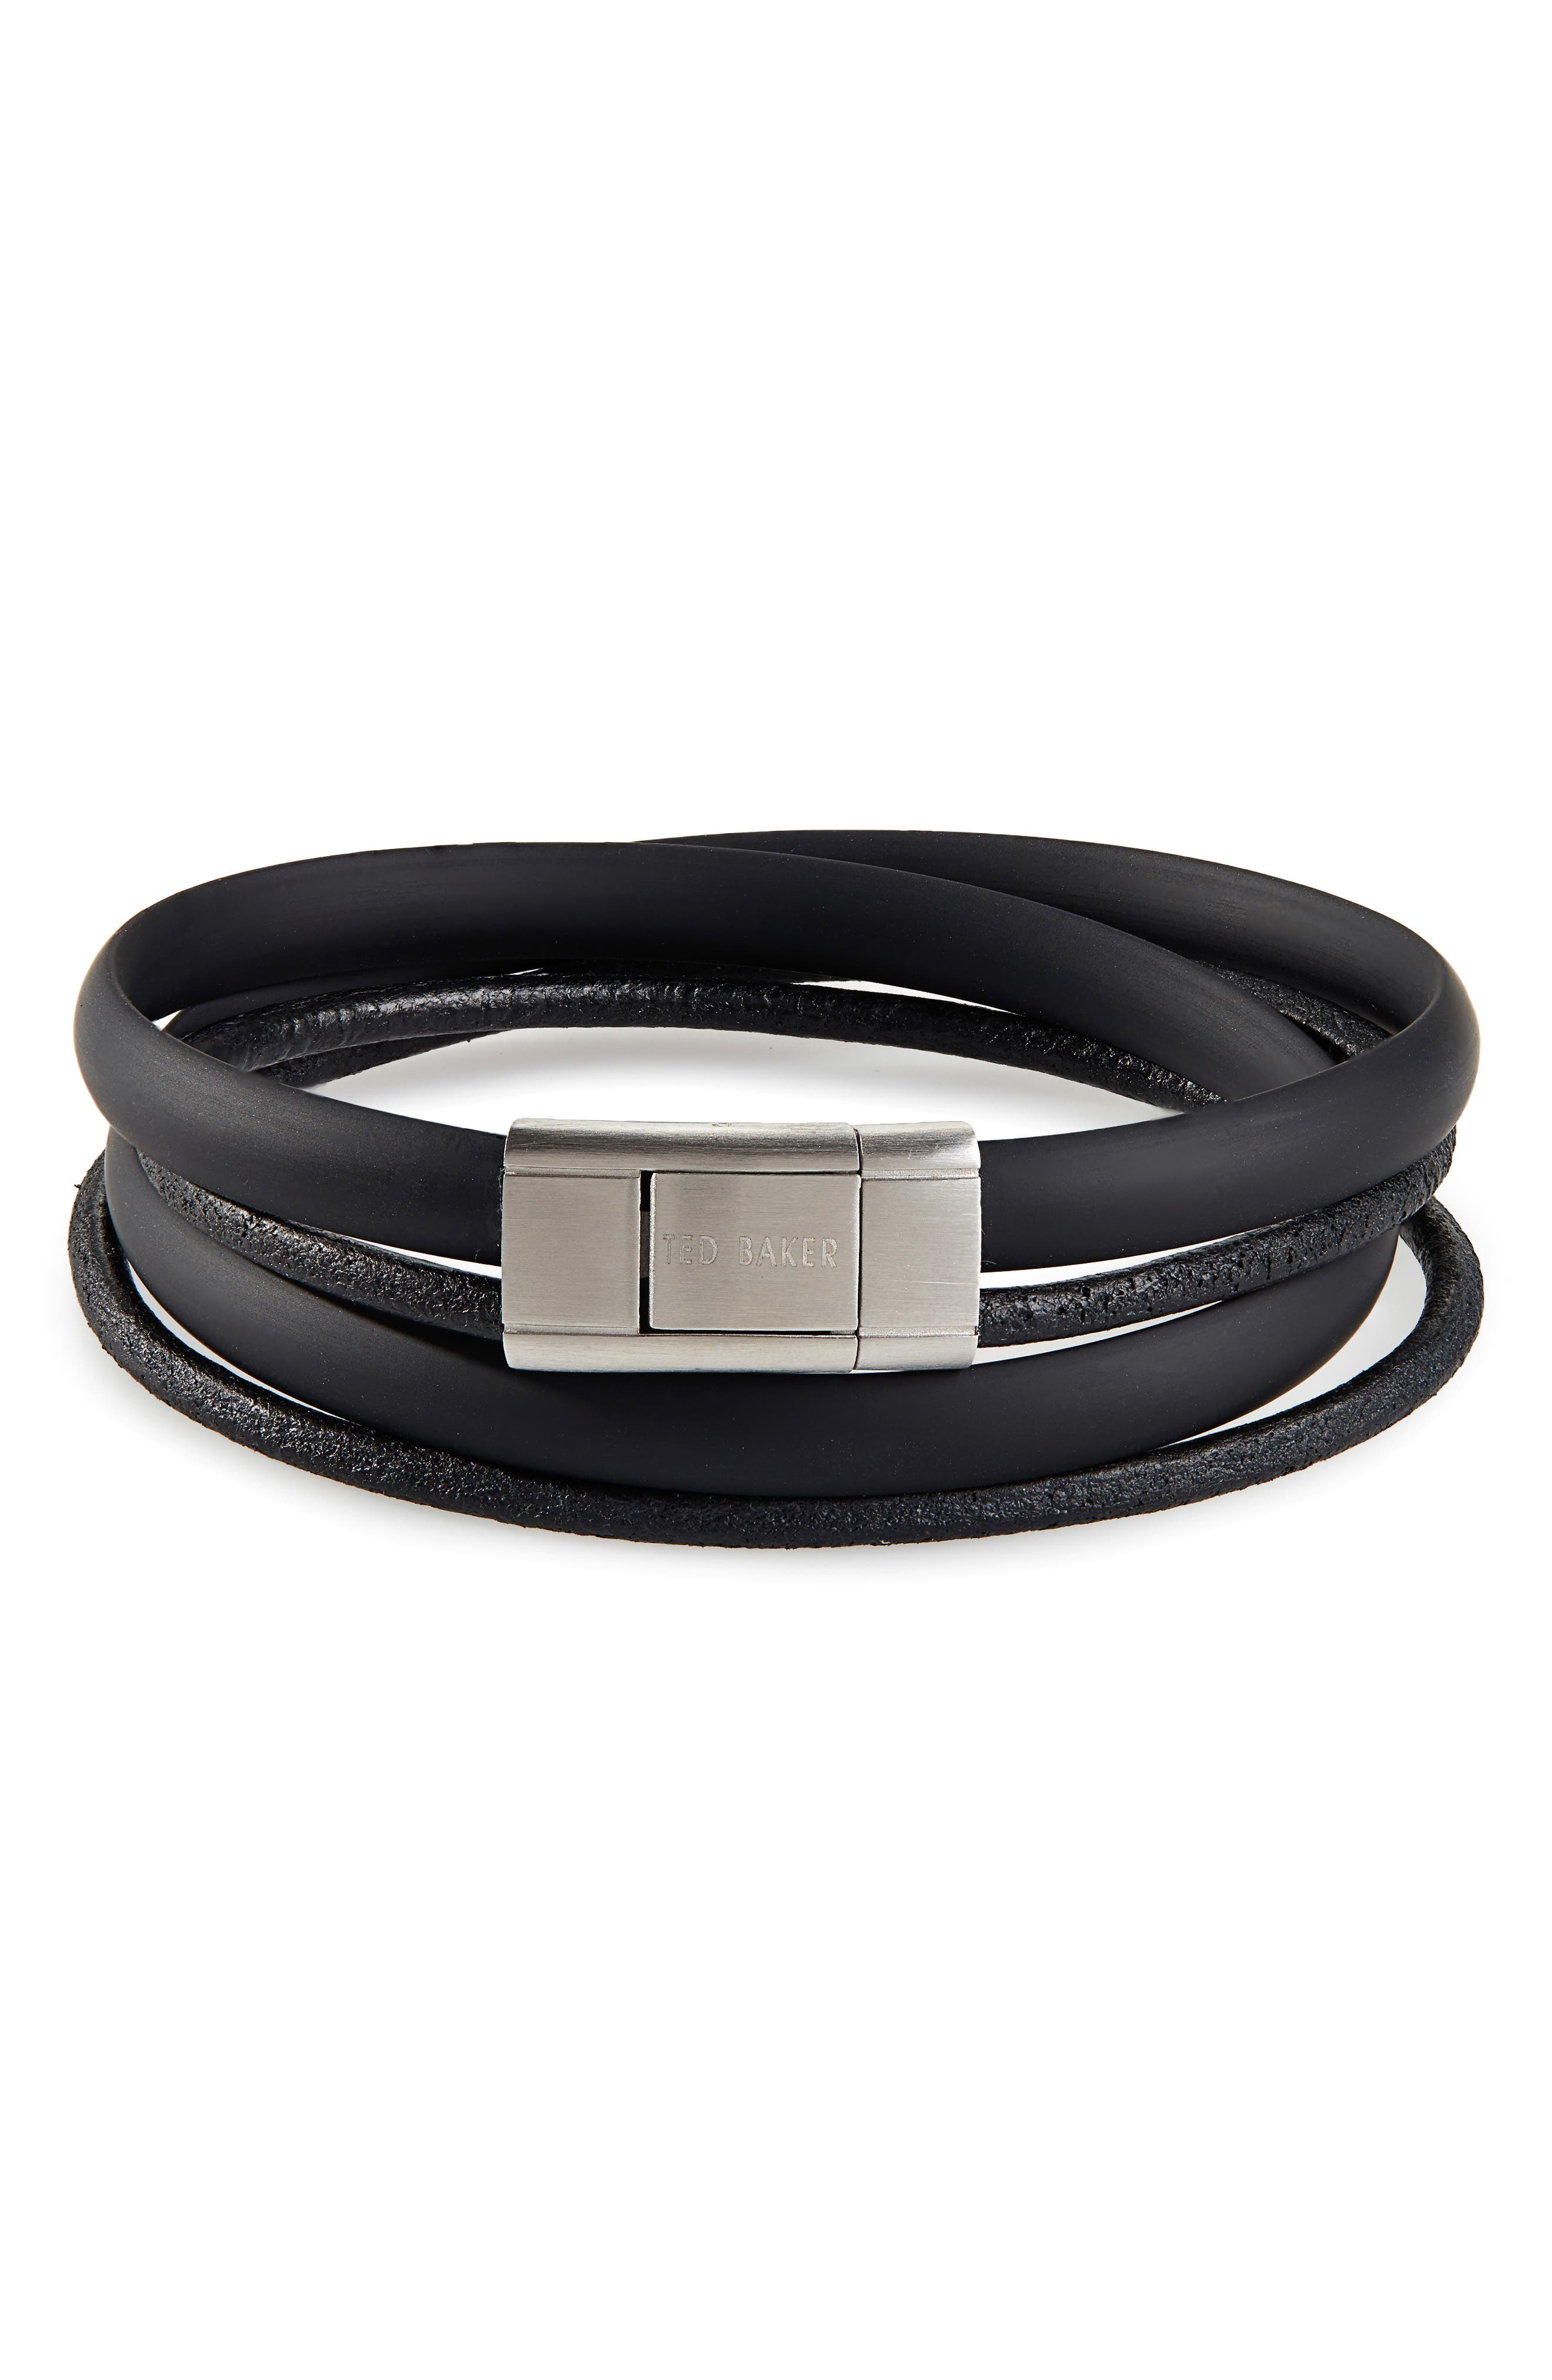 Mera Leather & Rubber Wrap Bracelet,                             Main thumbnail 1, color,                             BLACK